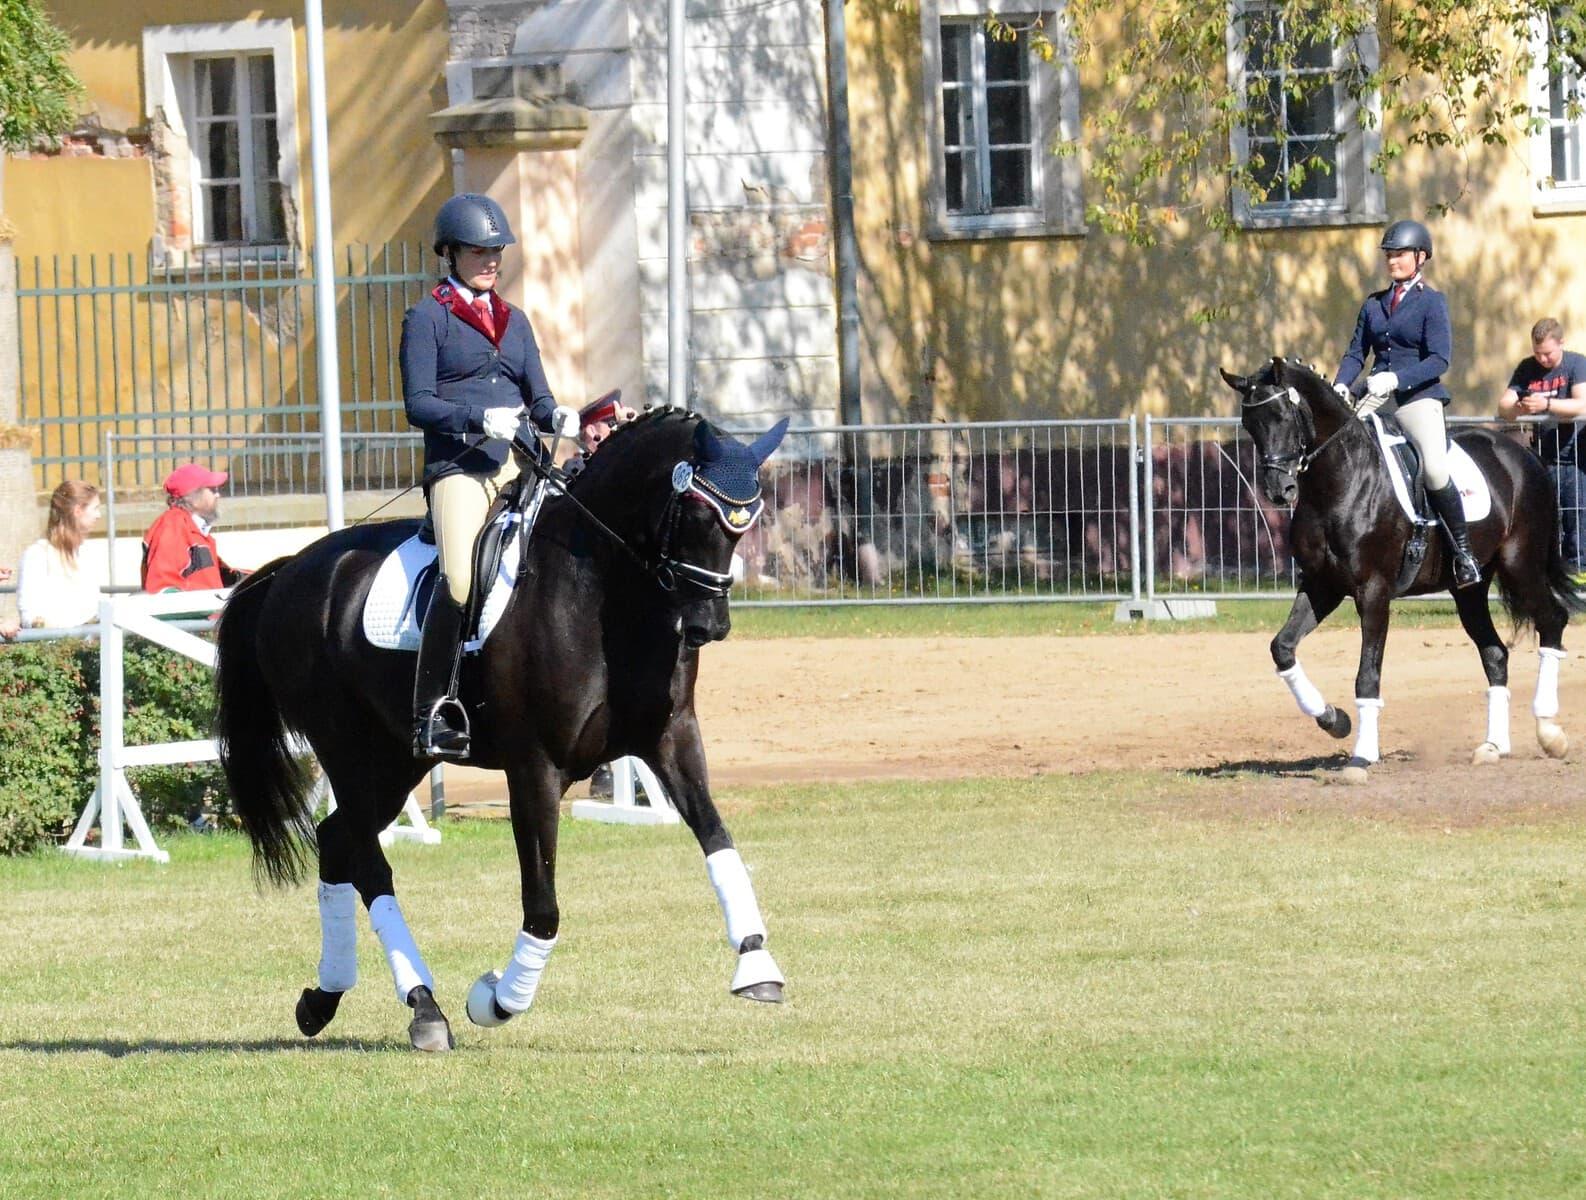 Championats-pferde-GOW-Stafanie-Fiedler-Phantastica-Nr.68